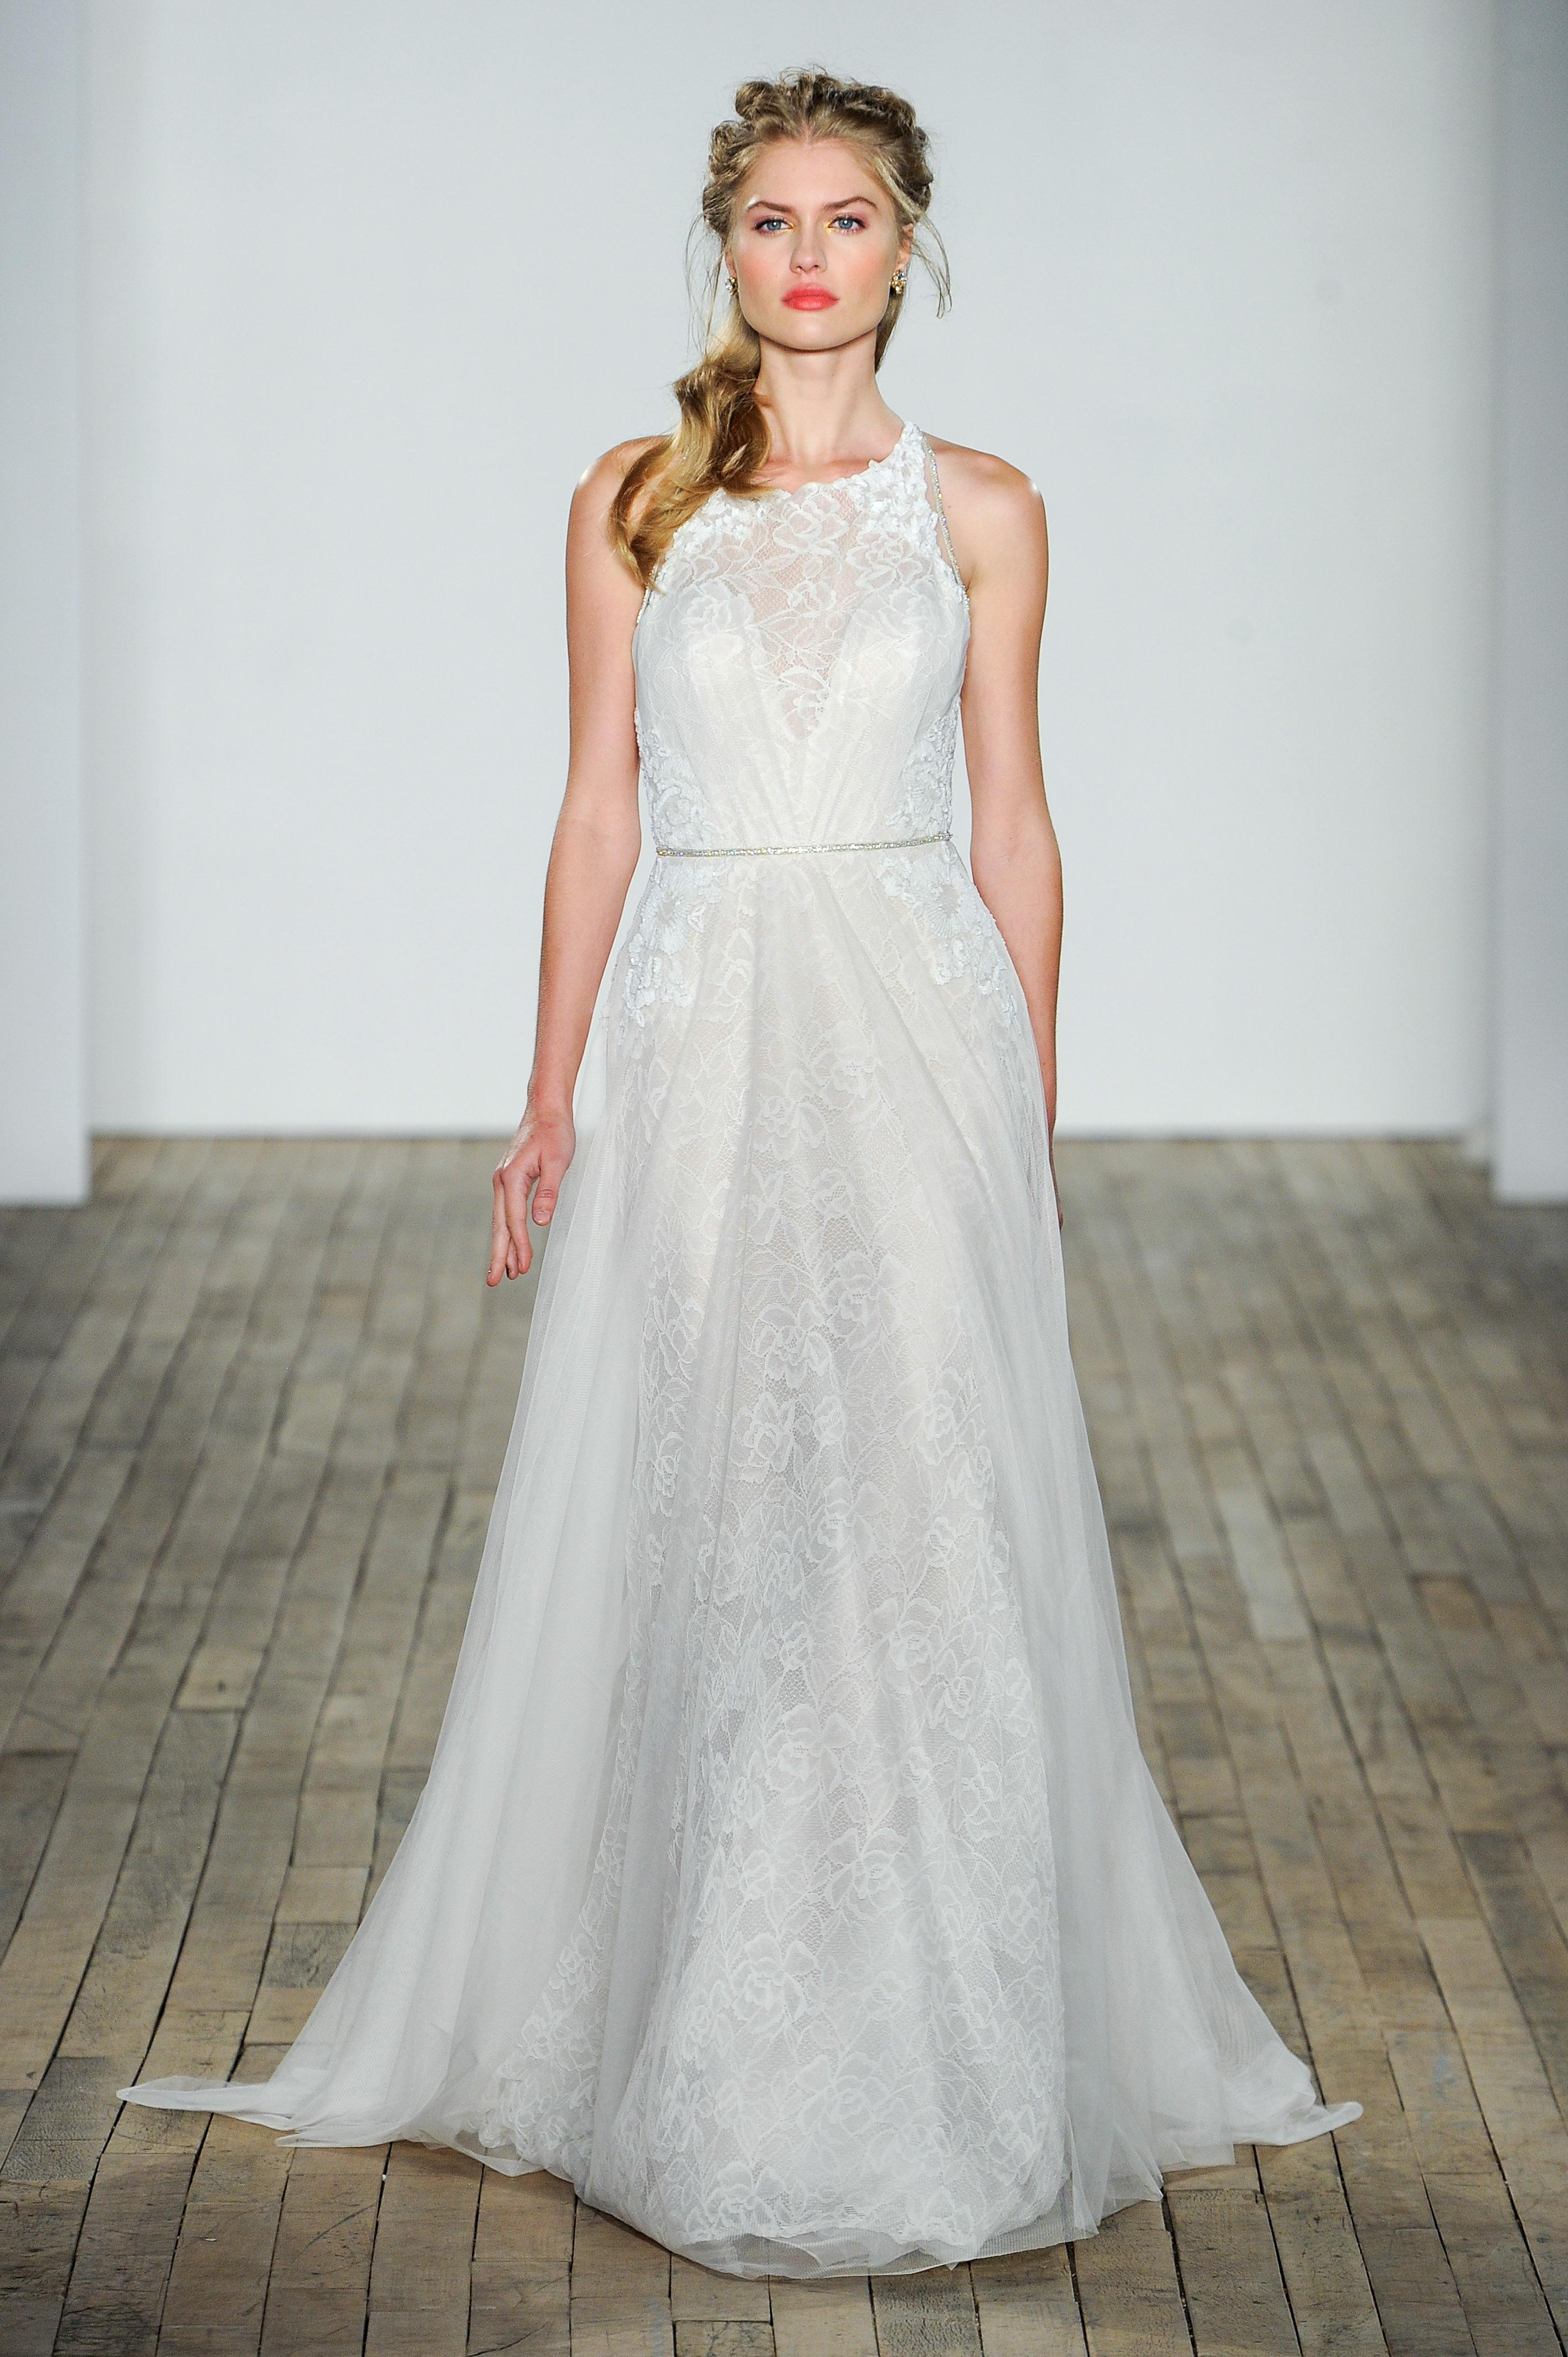 jlm blush by hayley paige wedding dress fall 2018 high neck lace